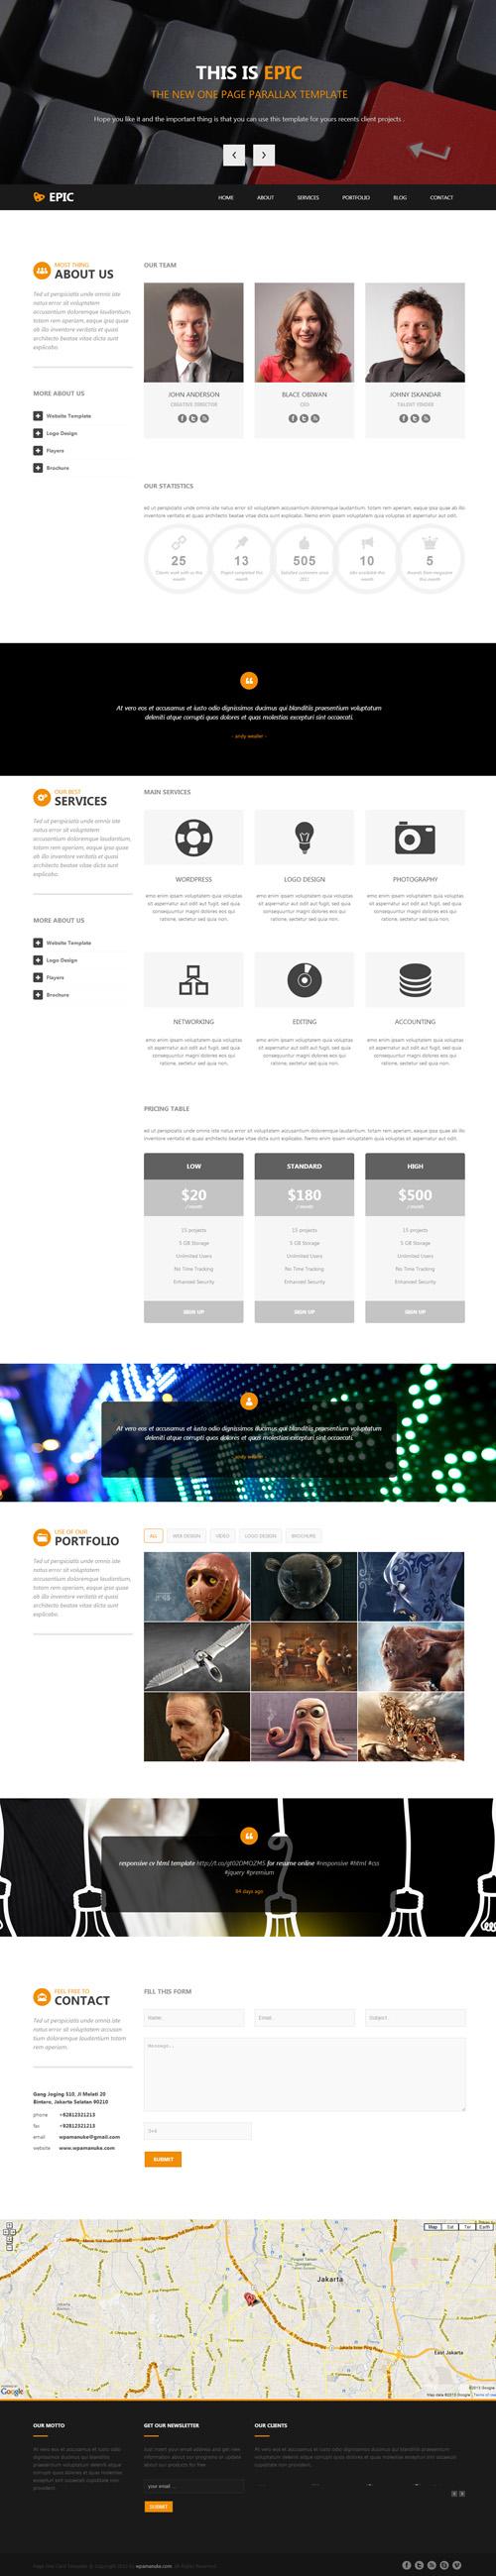 Epic One Page Parallax Html Template Webtemplates Webdesign Onepagetemplates Onepagewebsites Psdtemplates Web Template Design Html5 Templates Web Design